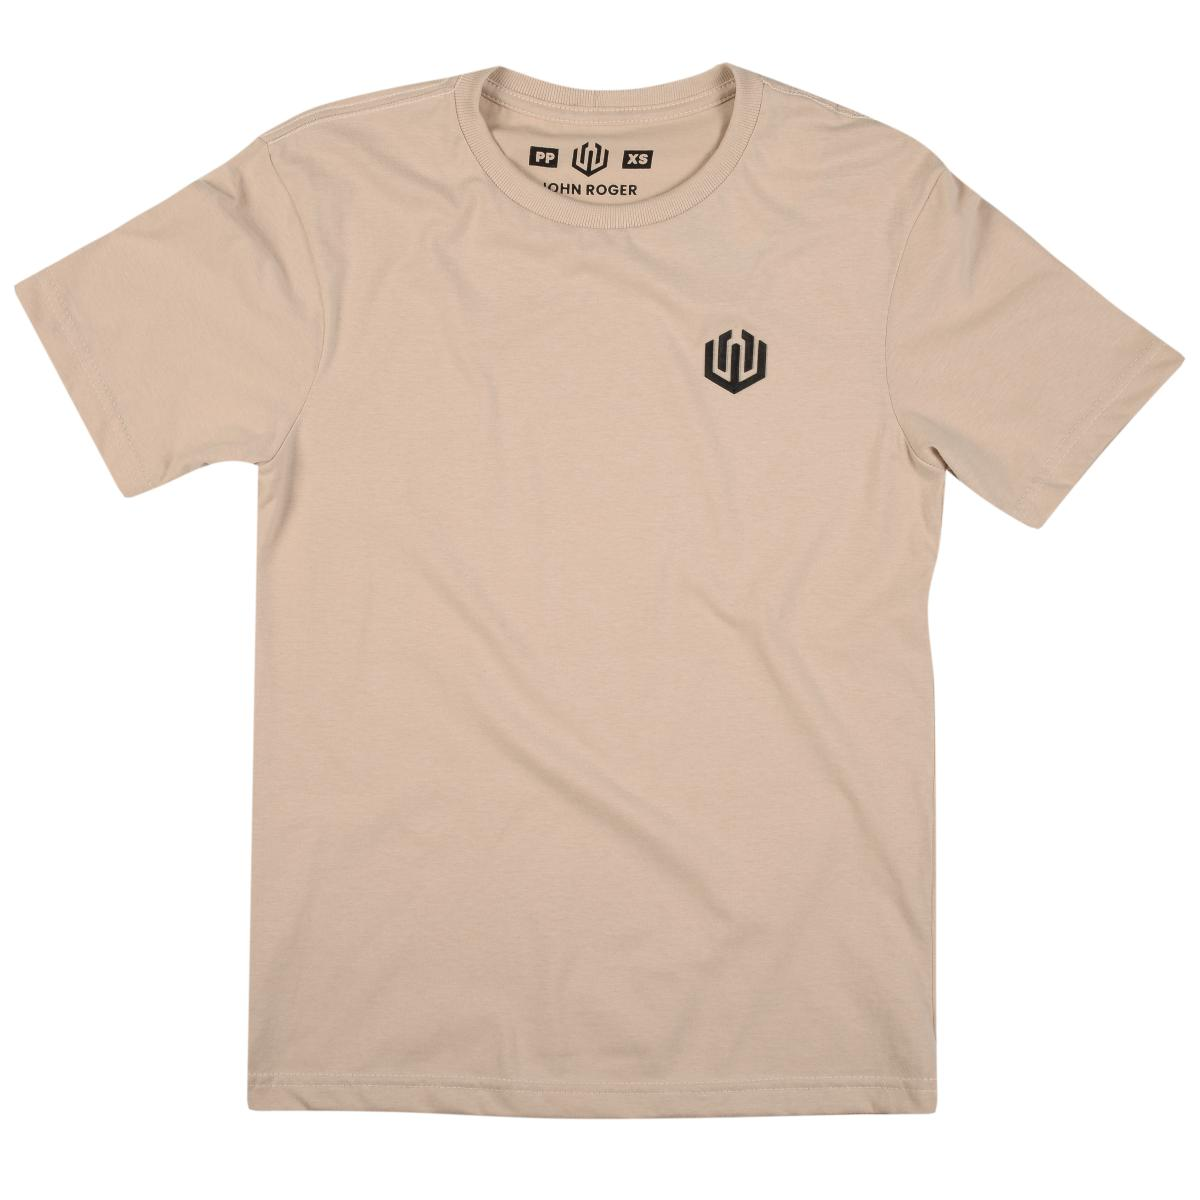 Camiseta John Roger Basic - bege